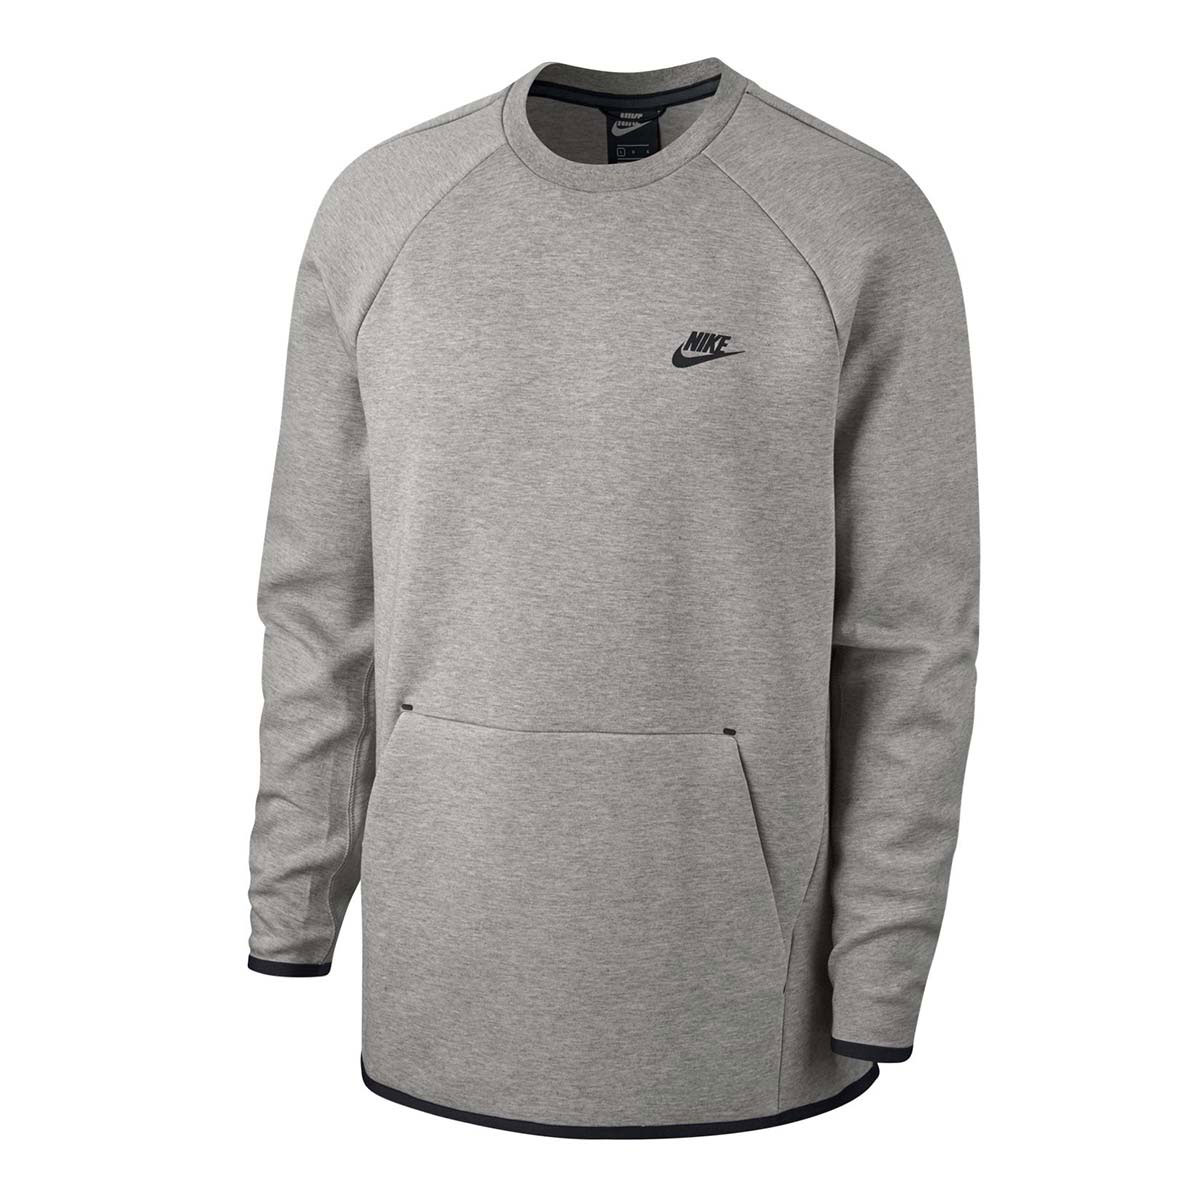 ac422cb7a6b Nike Tech Fleece Crew Sweater. 928471 063 Dark Grey Heather Black